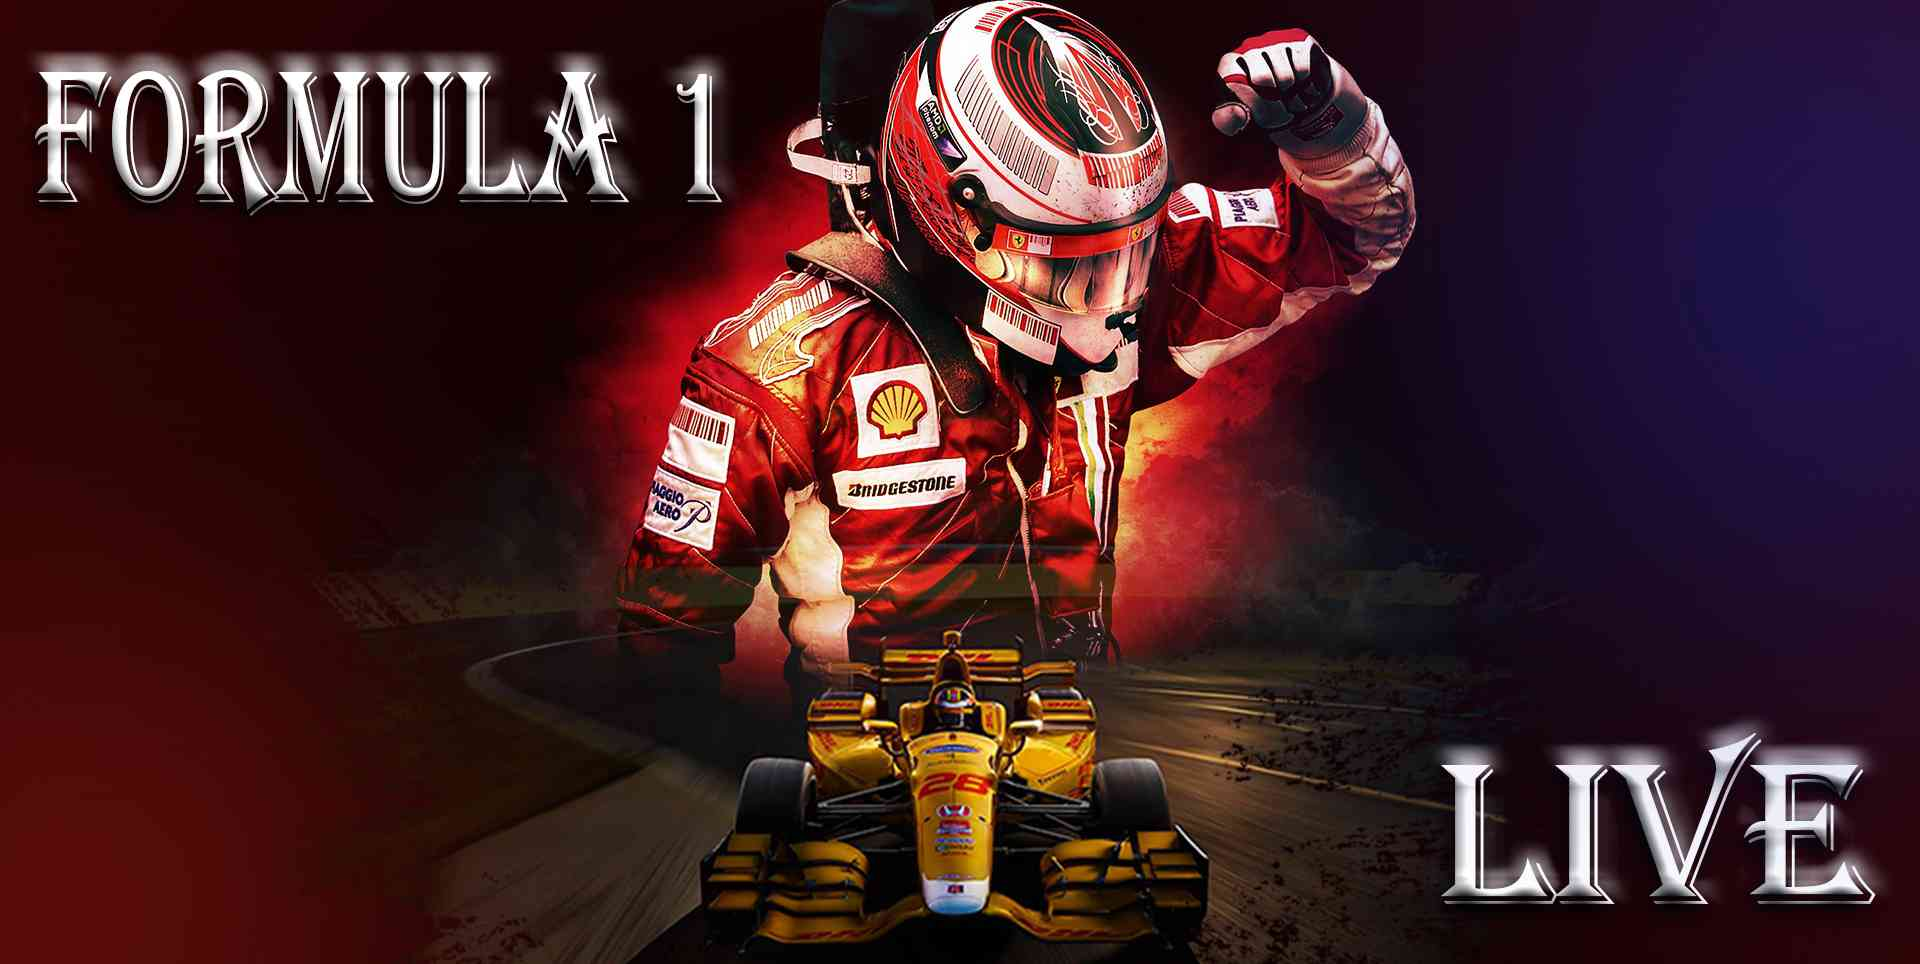 2016 Race Formula 4 ADAC Rnd 2 Live